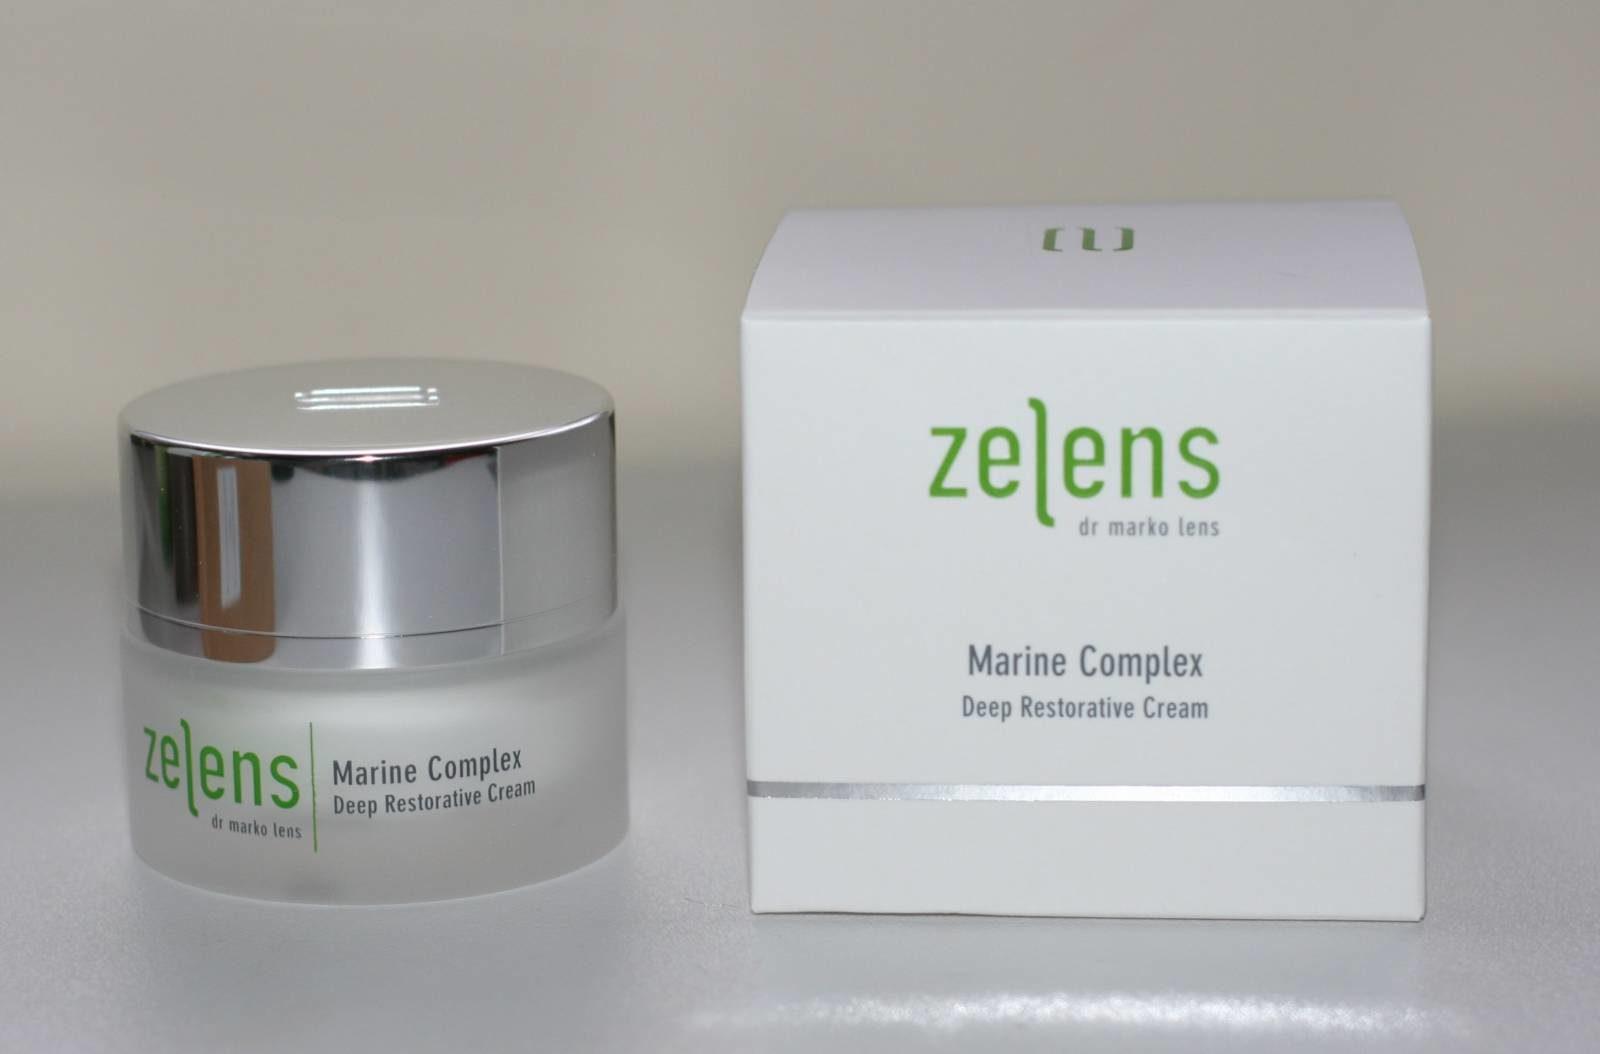 Zelens Marine Restorative Cream